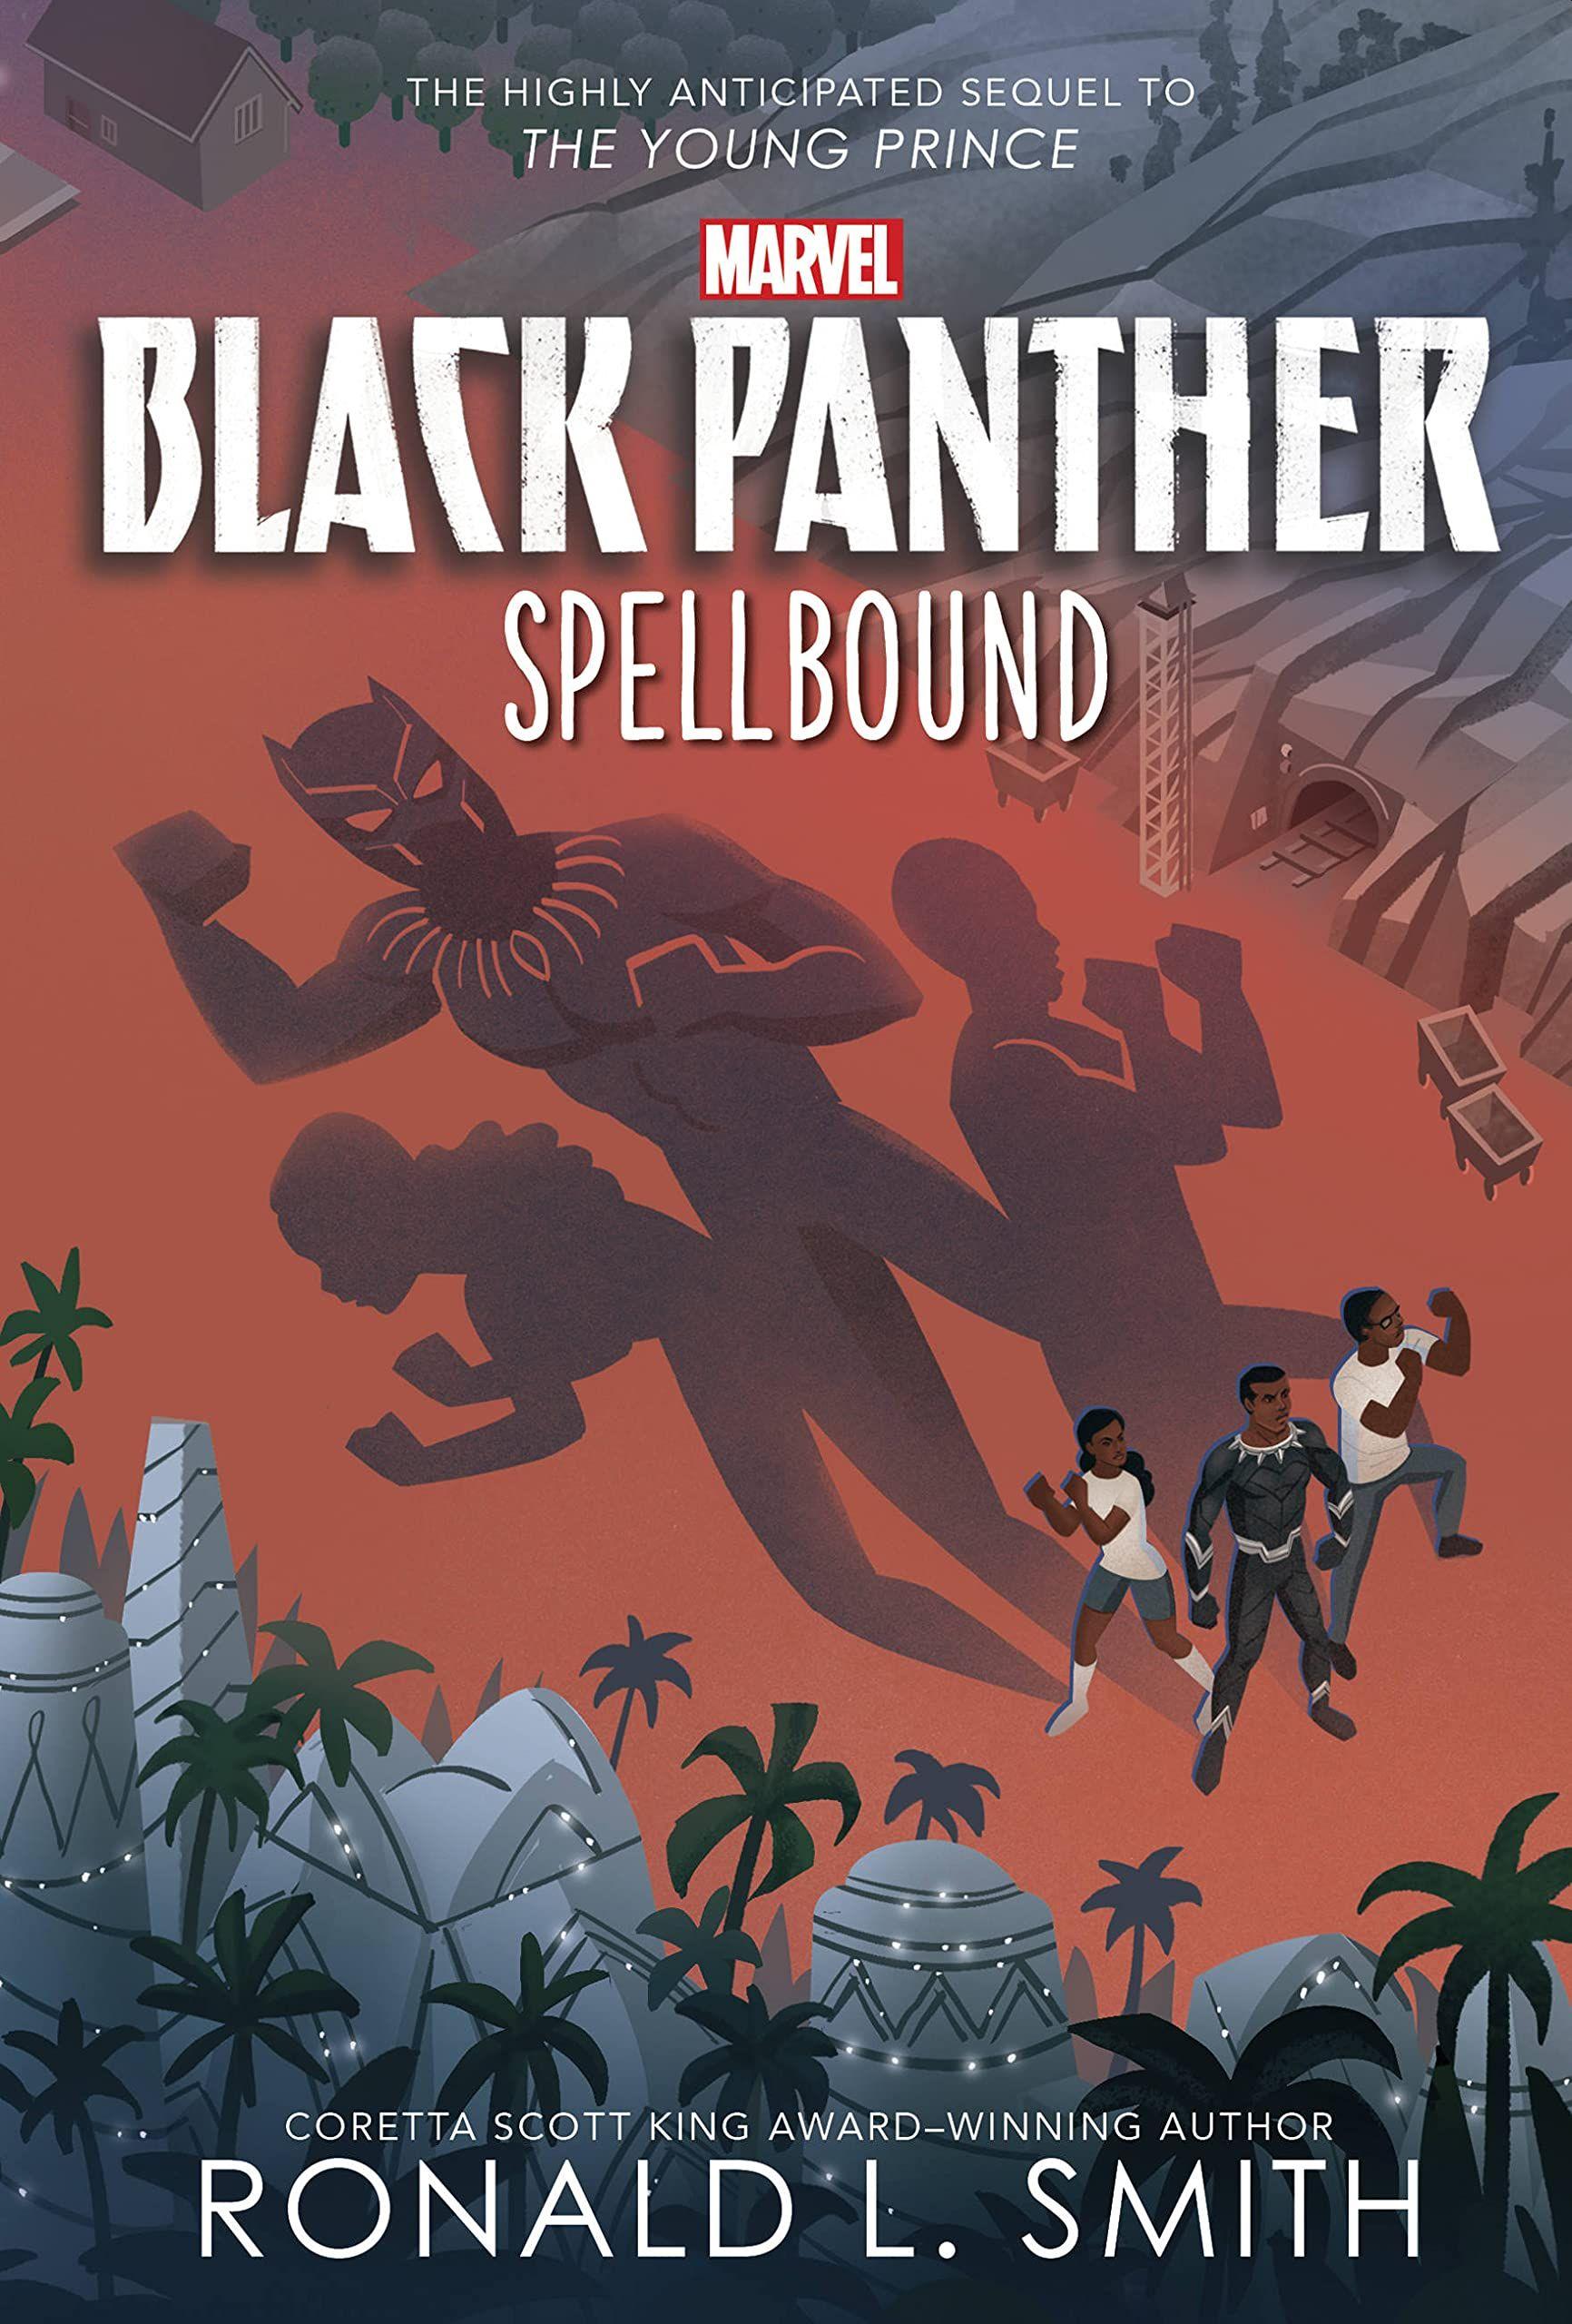 Black Panther Spellbound